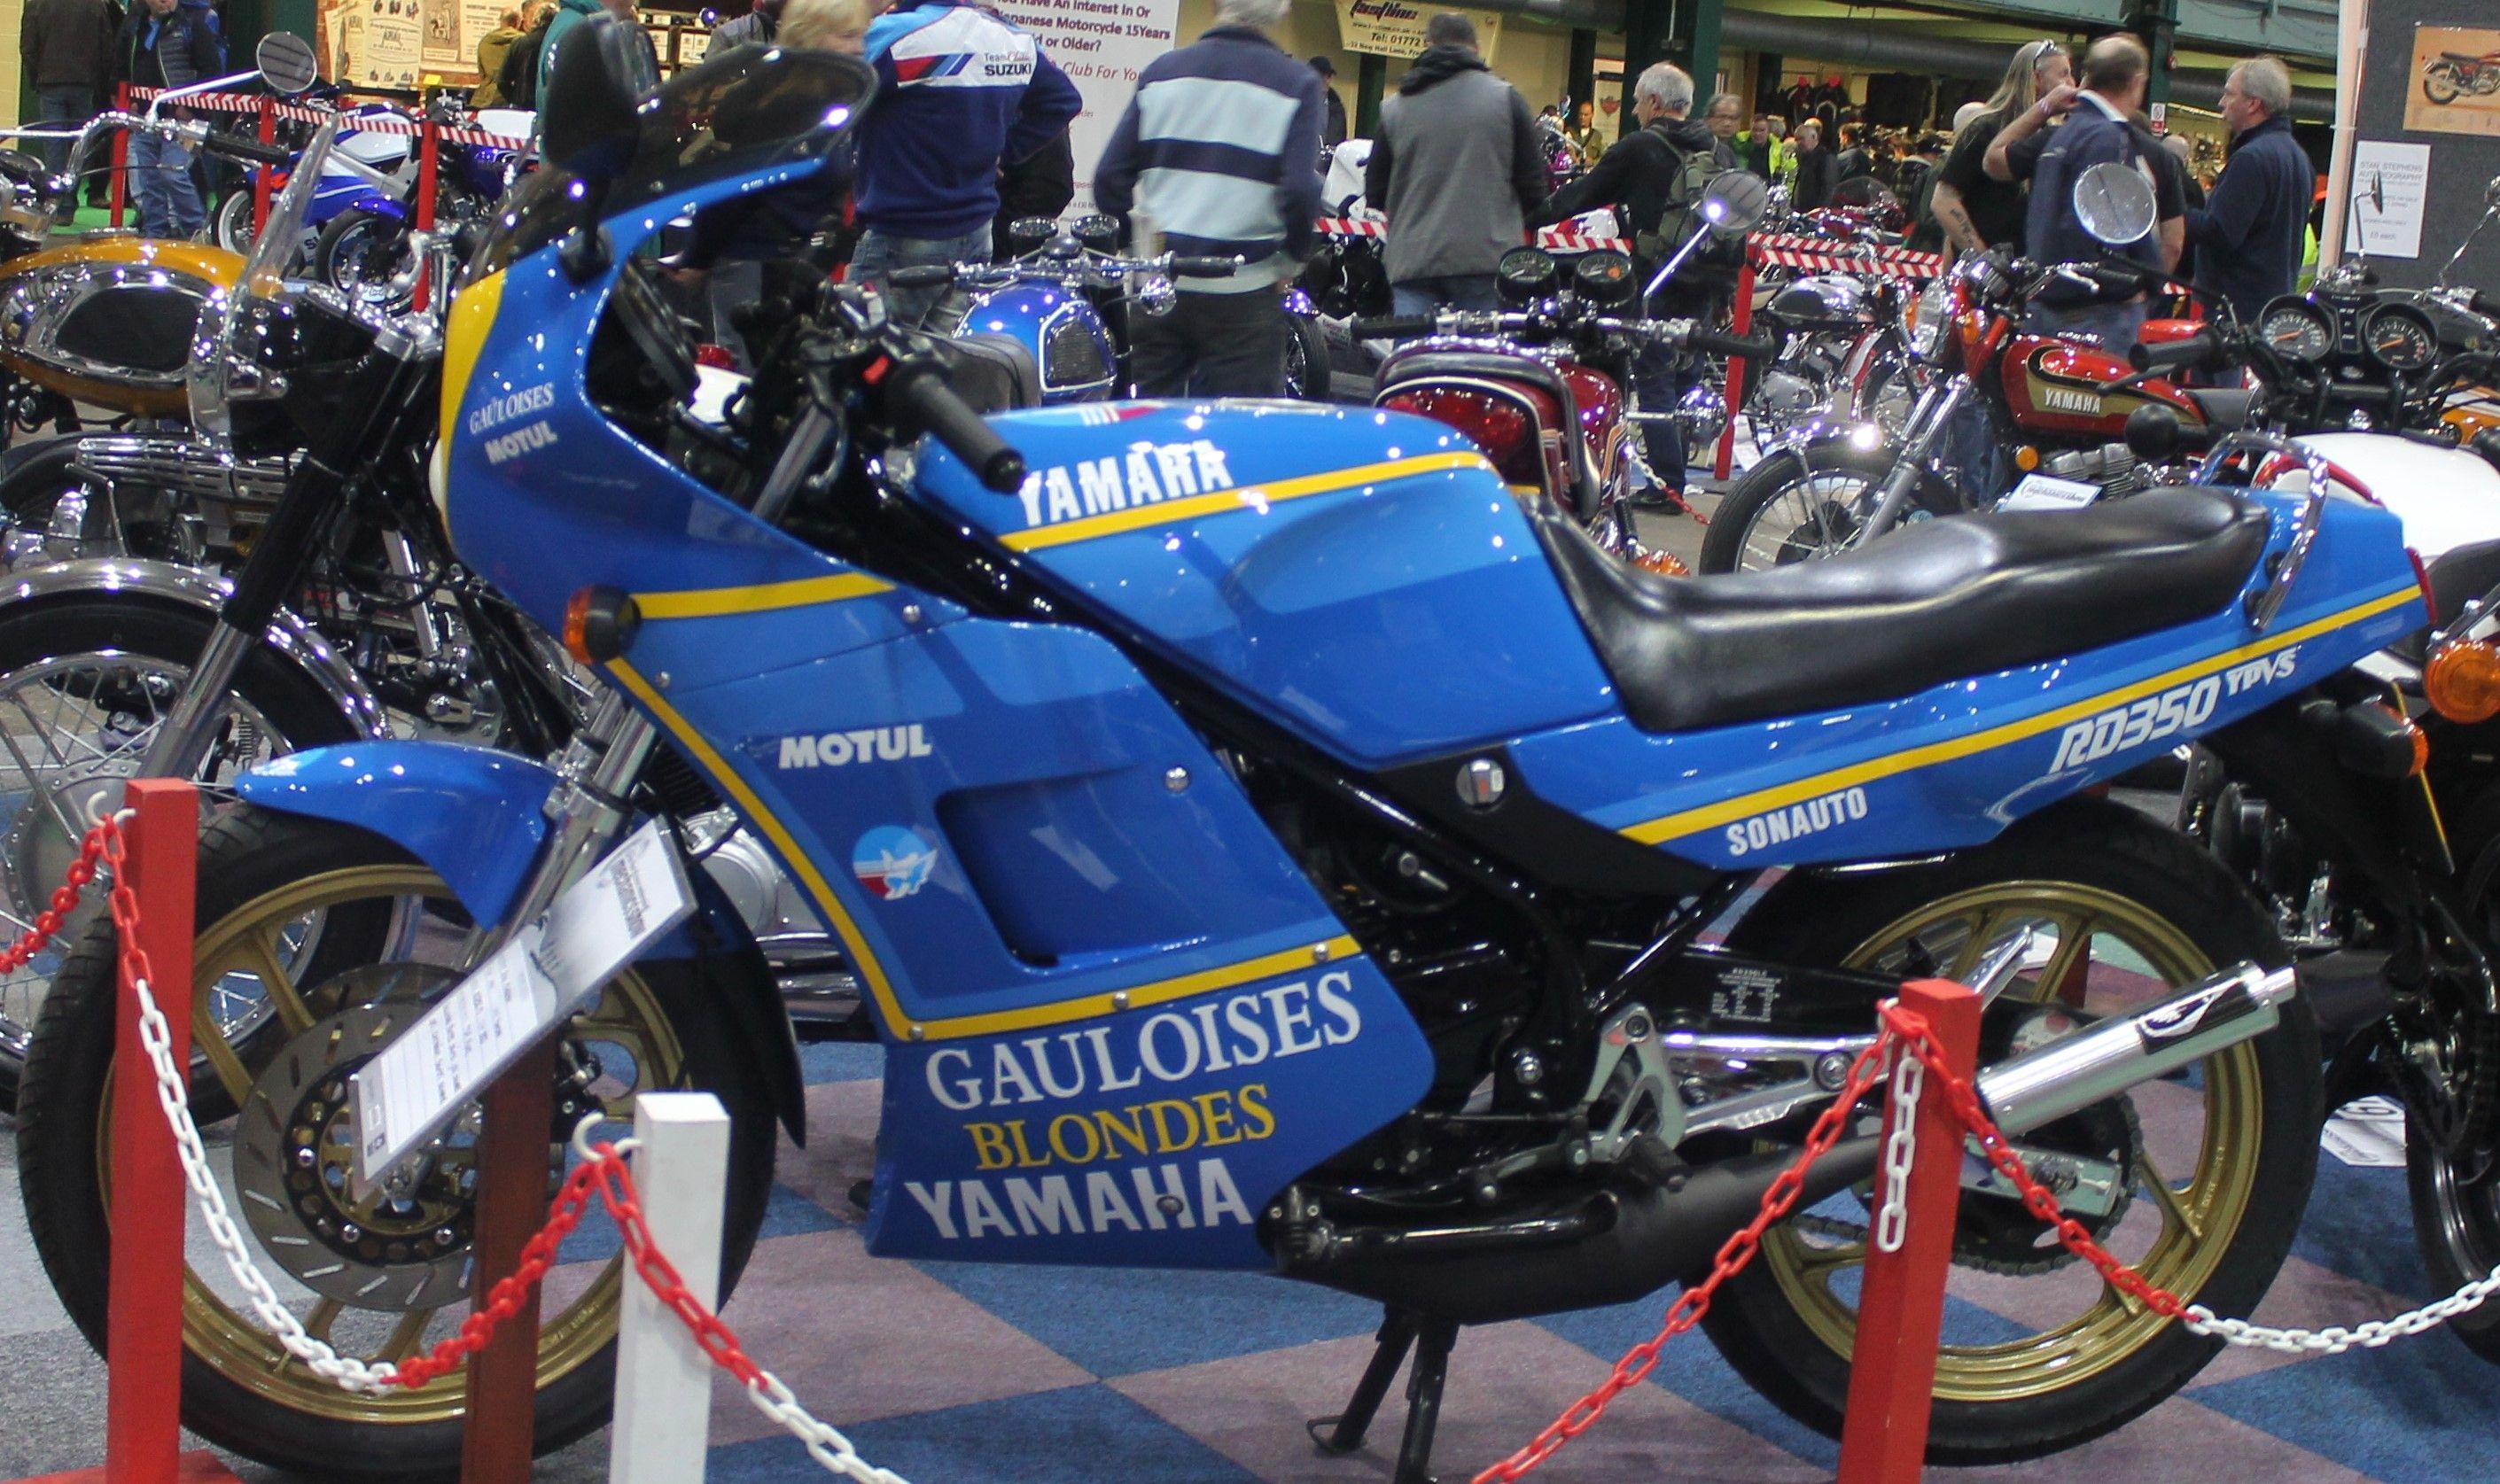 1991 Yamaha Rd350 F2 Gauloises Blondes Christian Sarron Tribute Yamaha Biker Life Bike